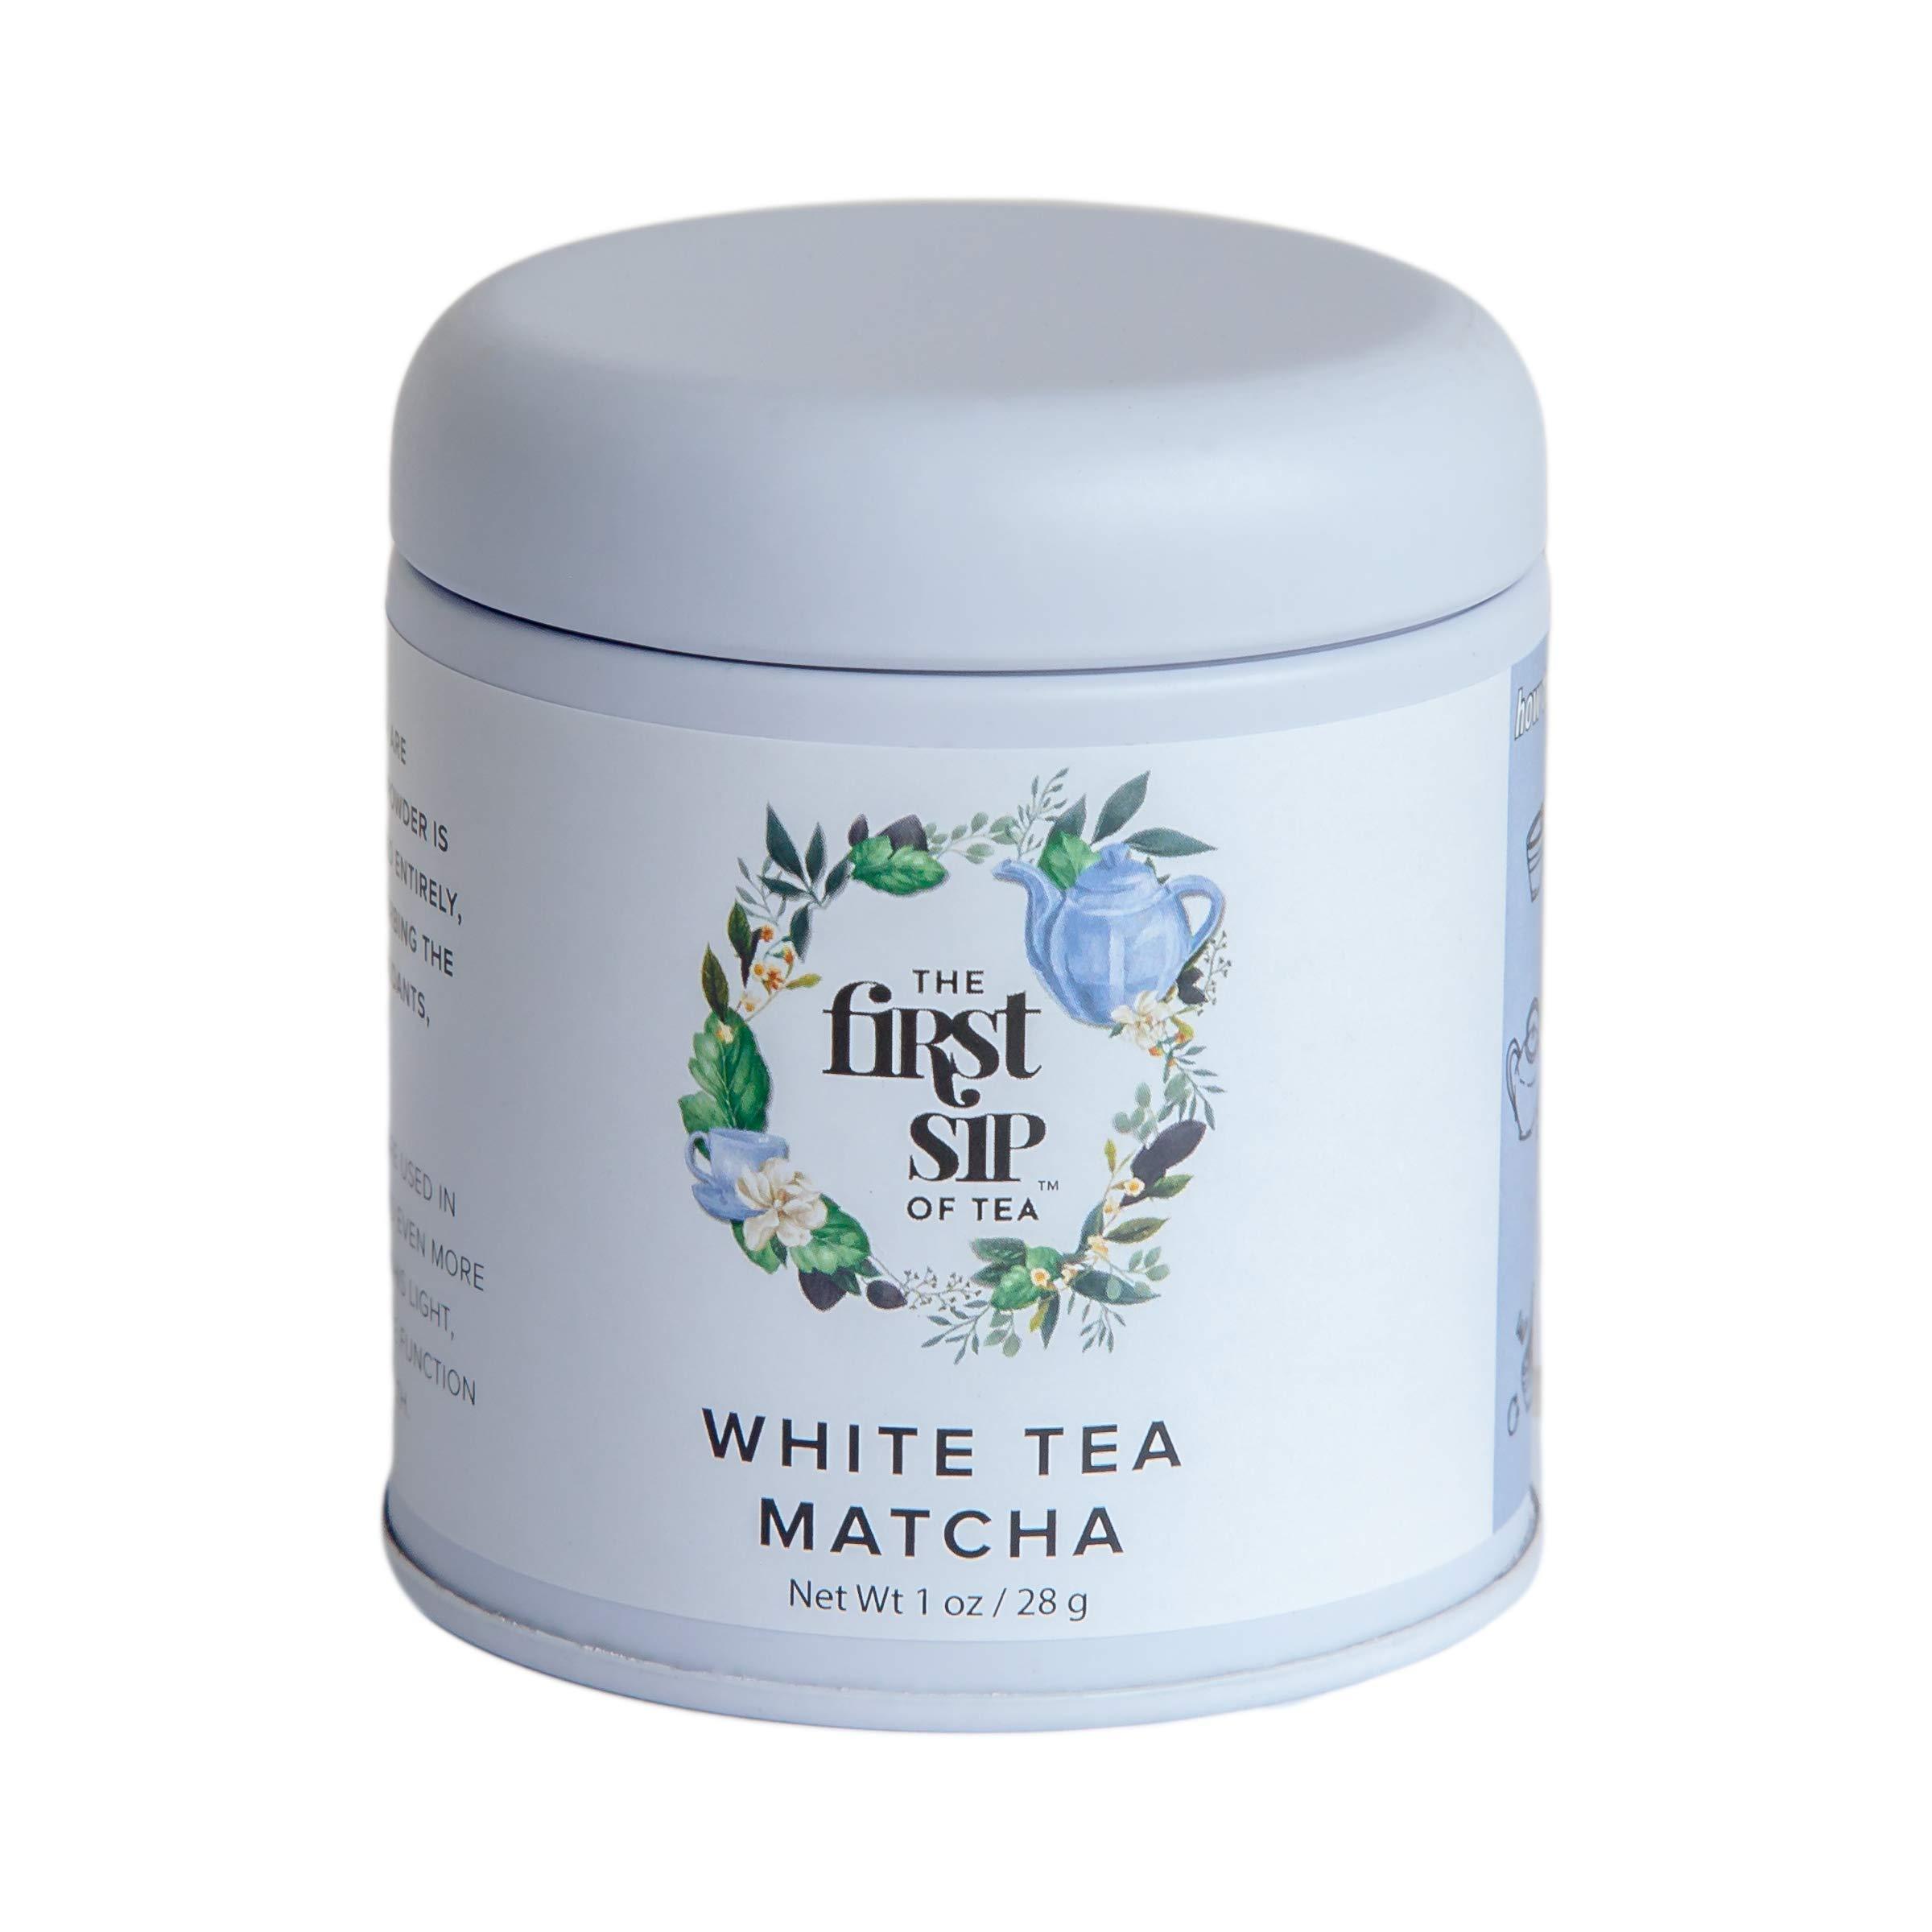 The First Sip Of Tea - Matcha White Tea Powder, Pure 1 Oz